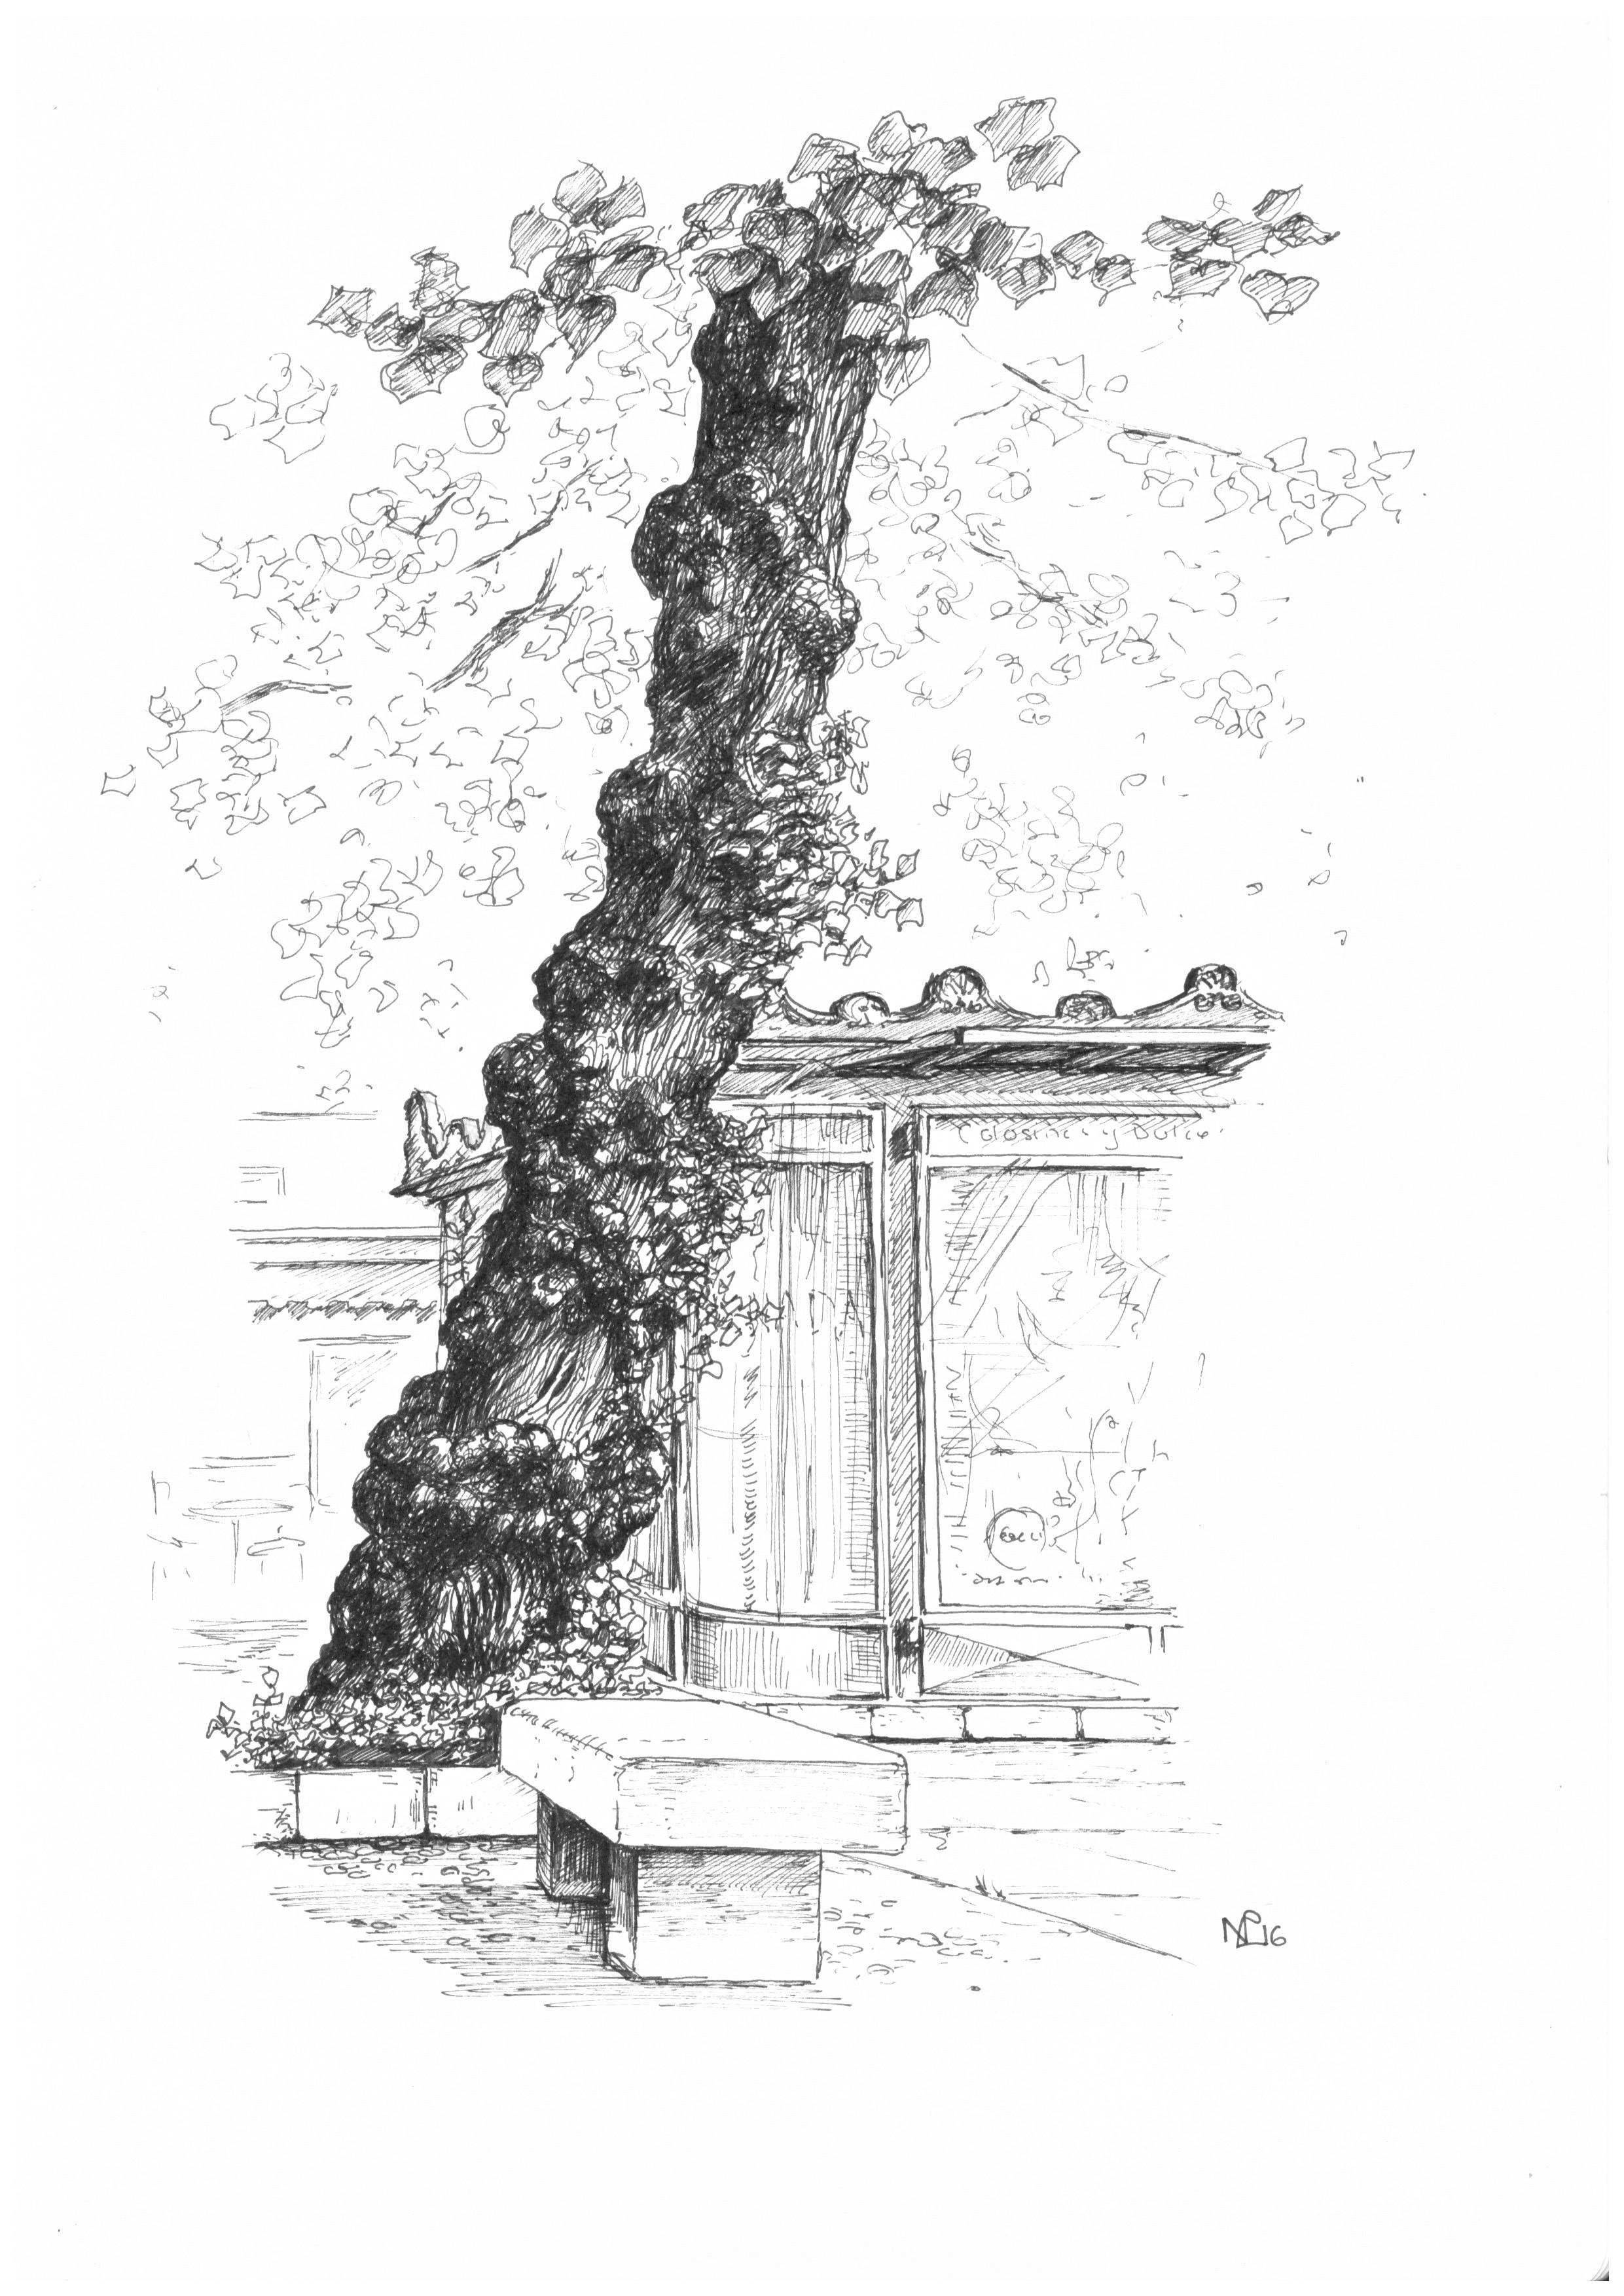 Granada Bib Rambla